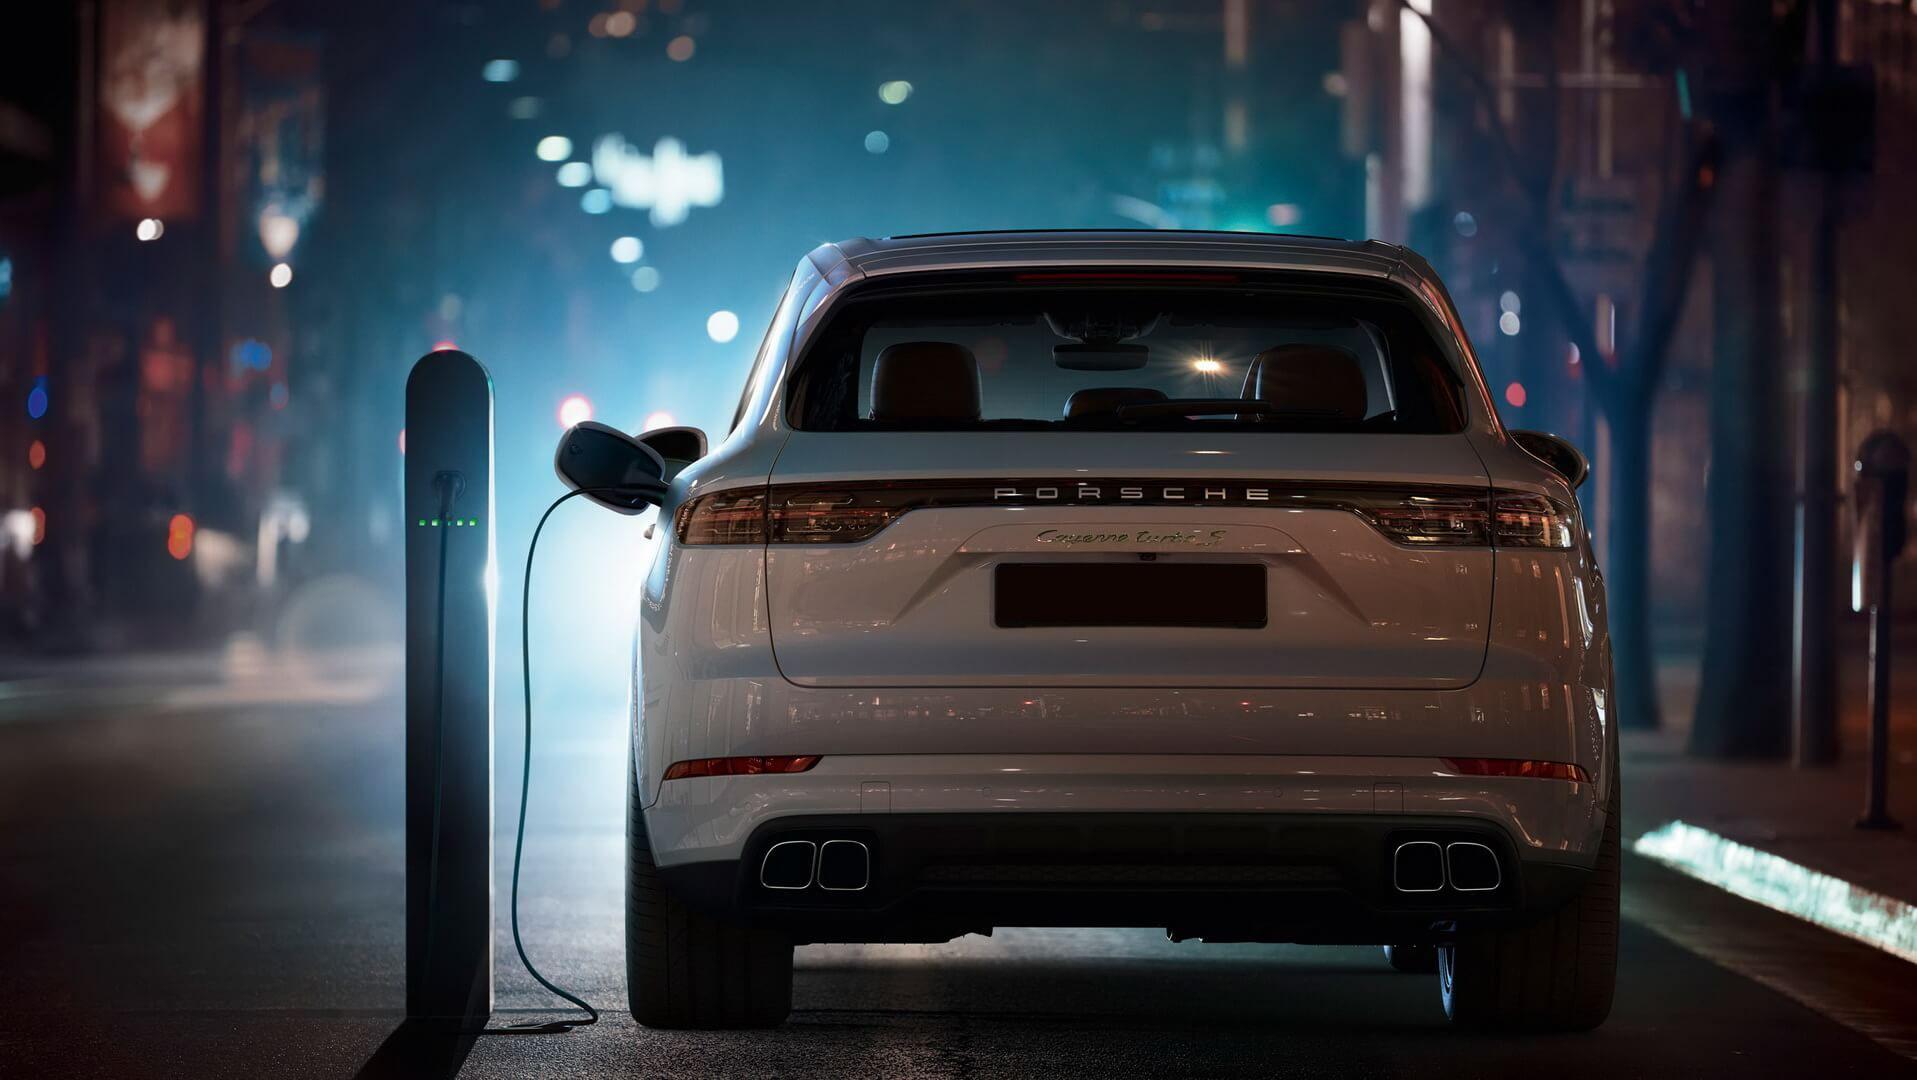 porsche-cayenne-turbo-s-e-hybrid-2019-hevcars-5-min